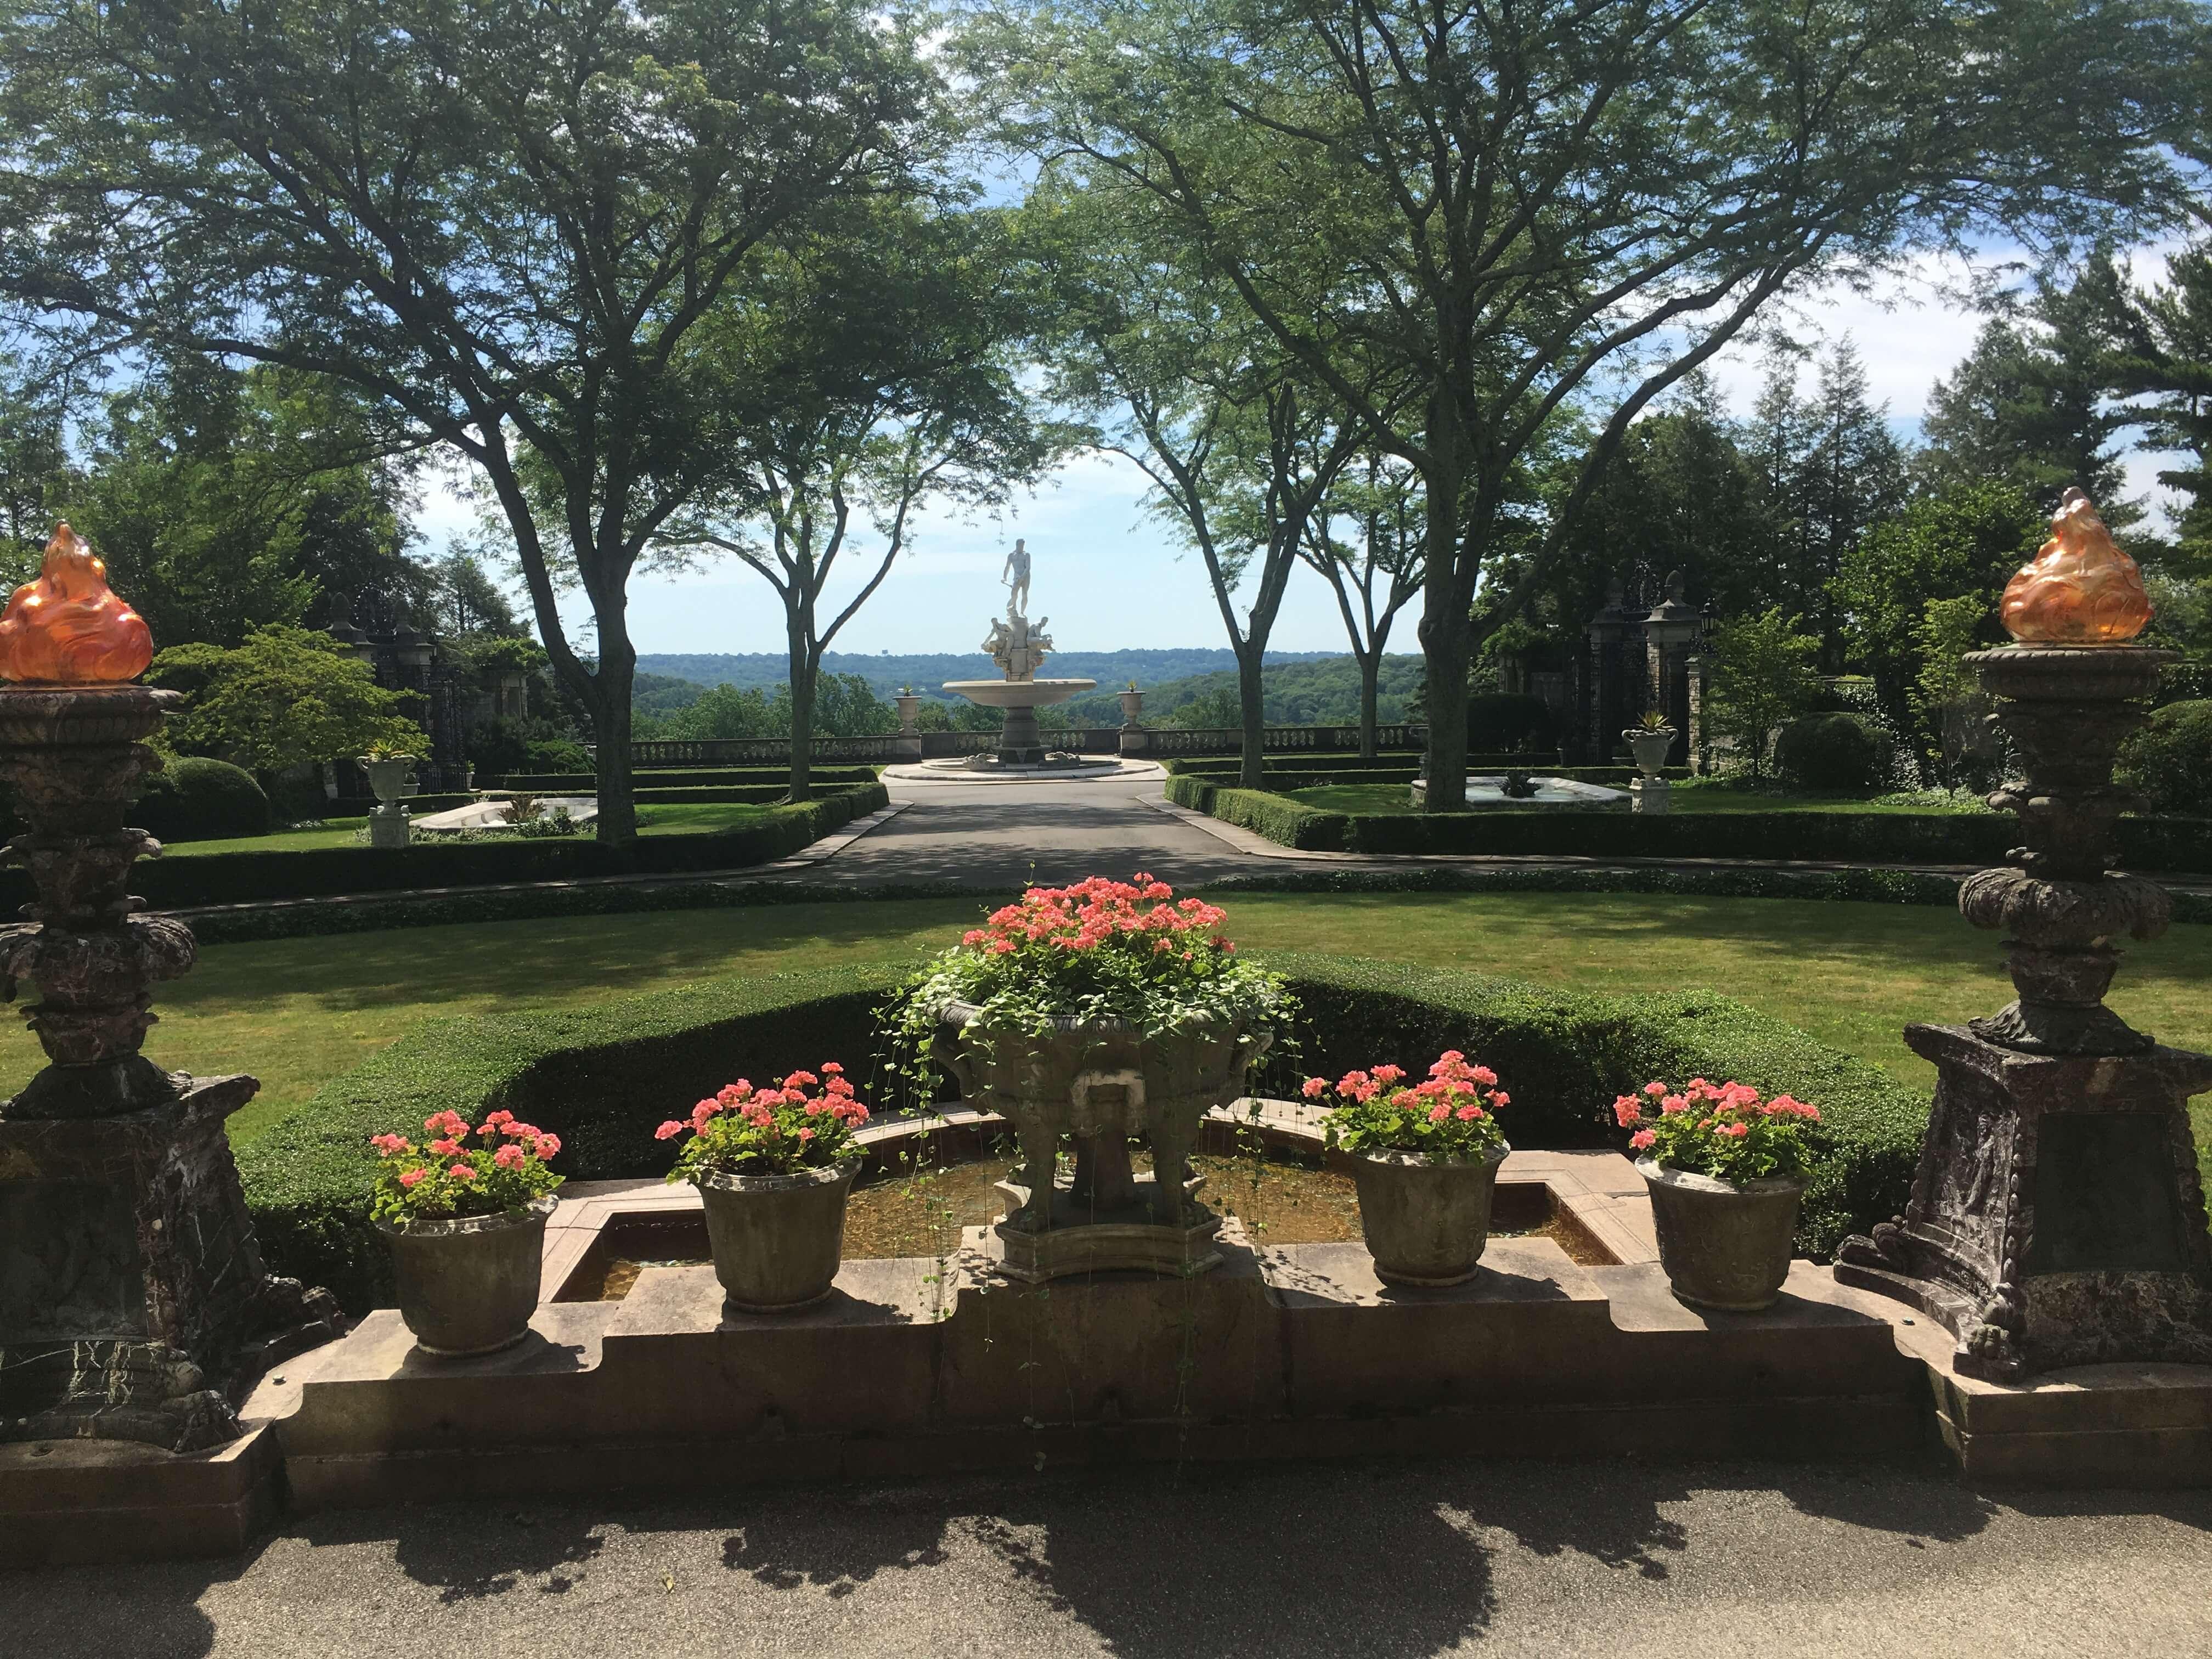 Kykuit rockerfeller house garden review